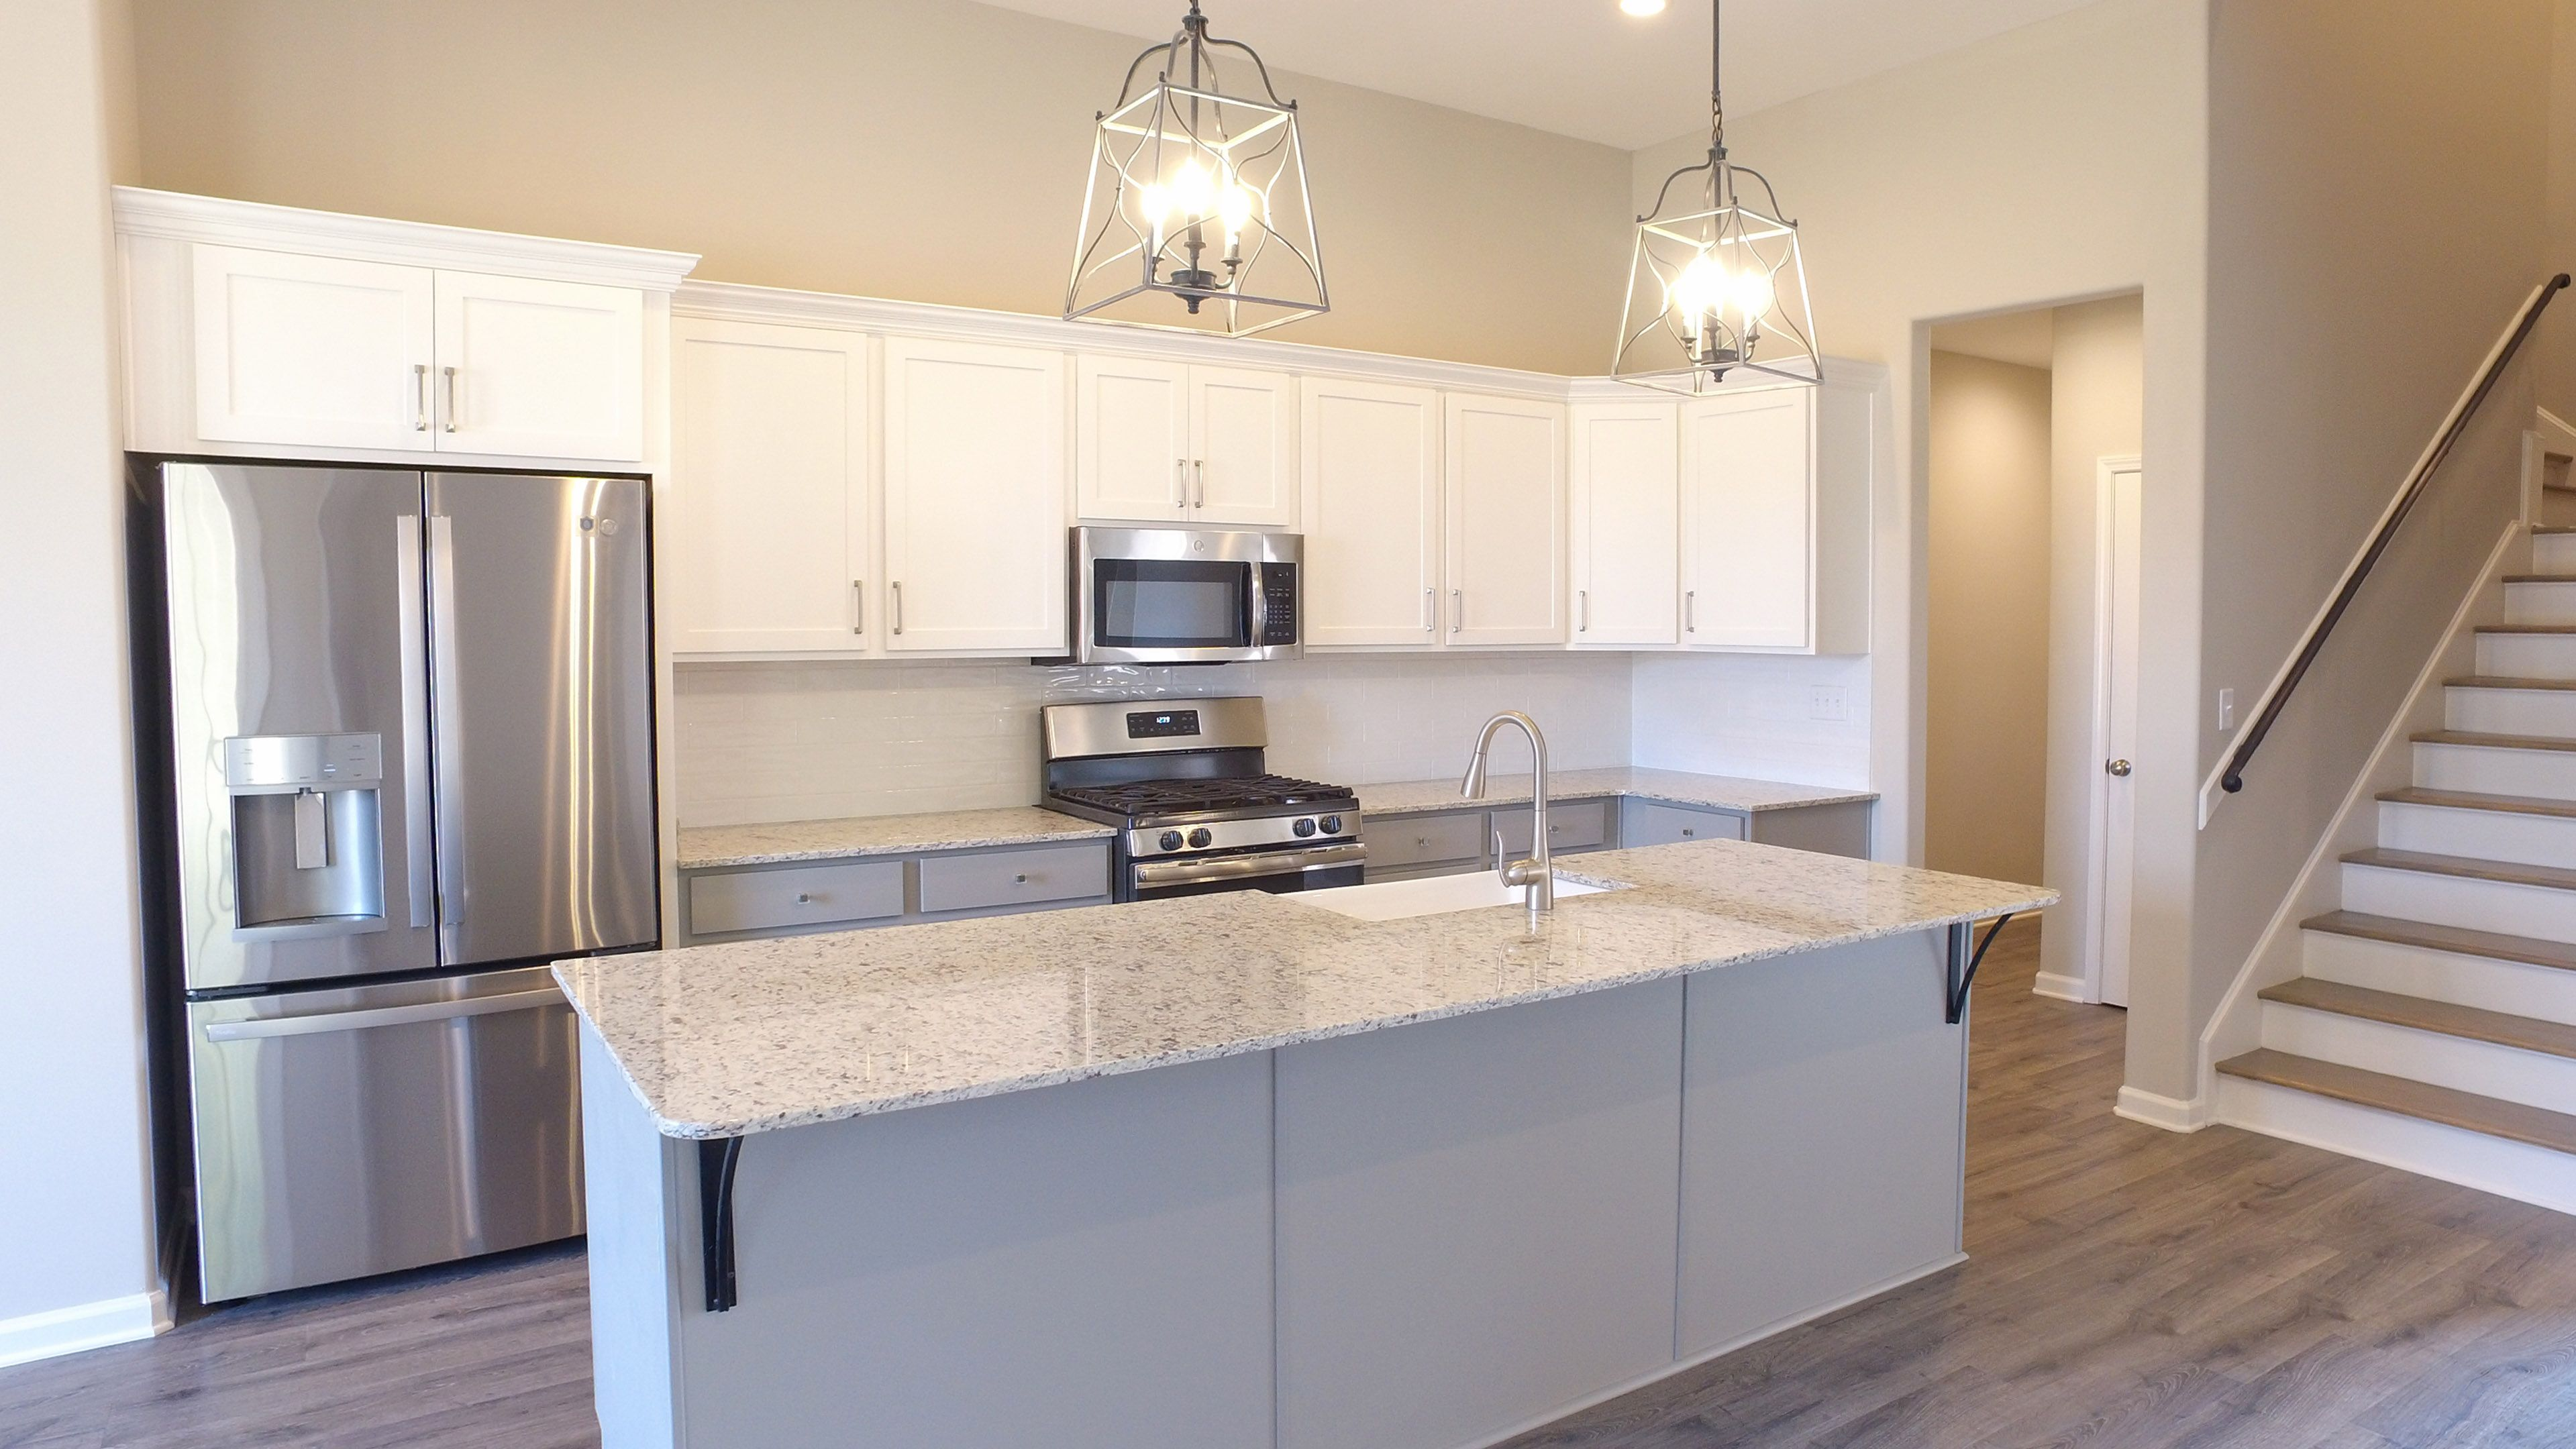 Kitchen featured in the Carlisle By Regency Homebuilders in Memphis, TN